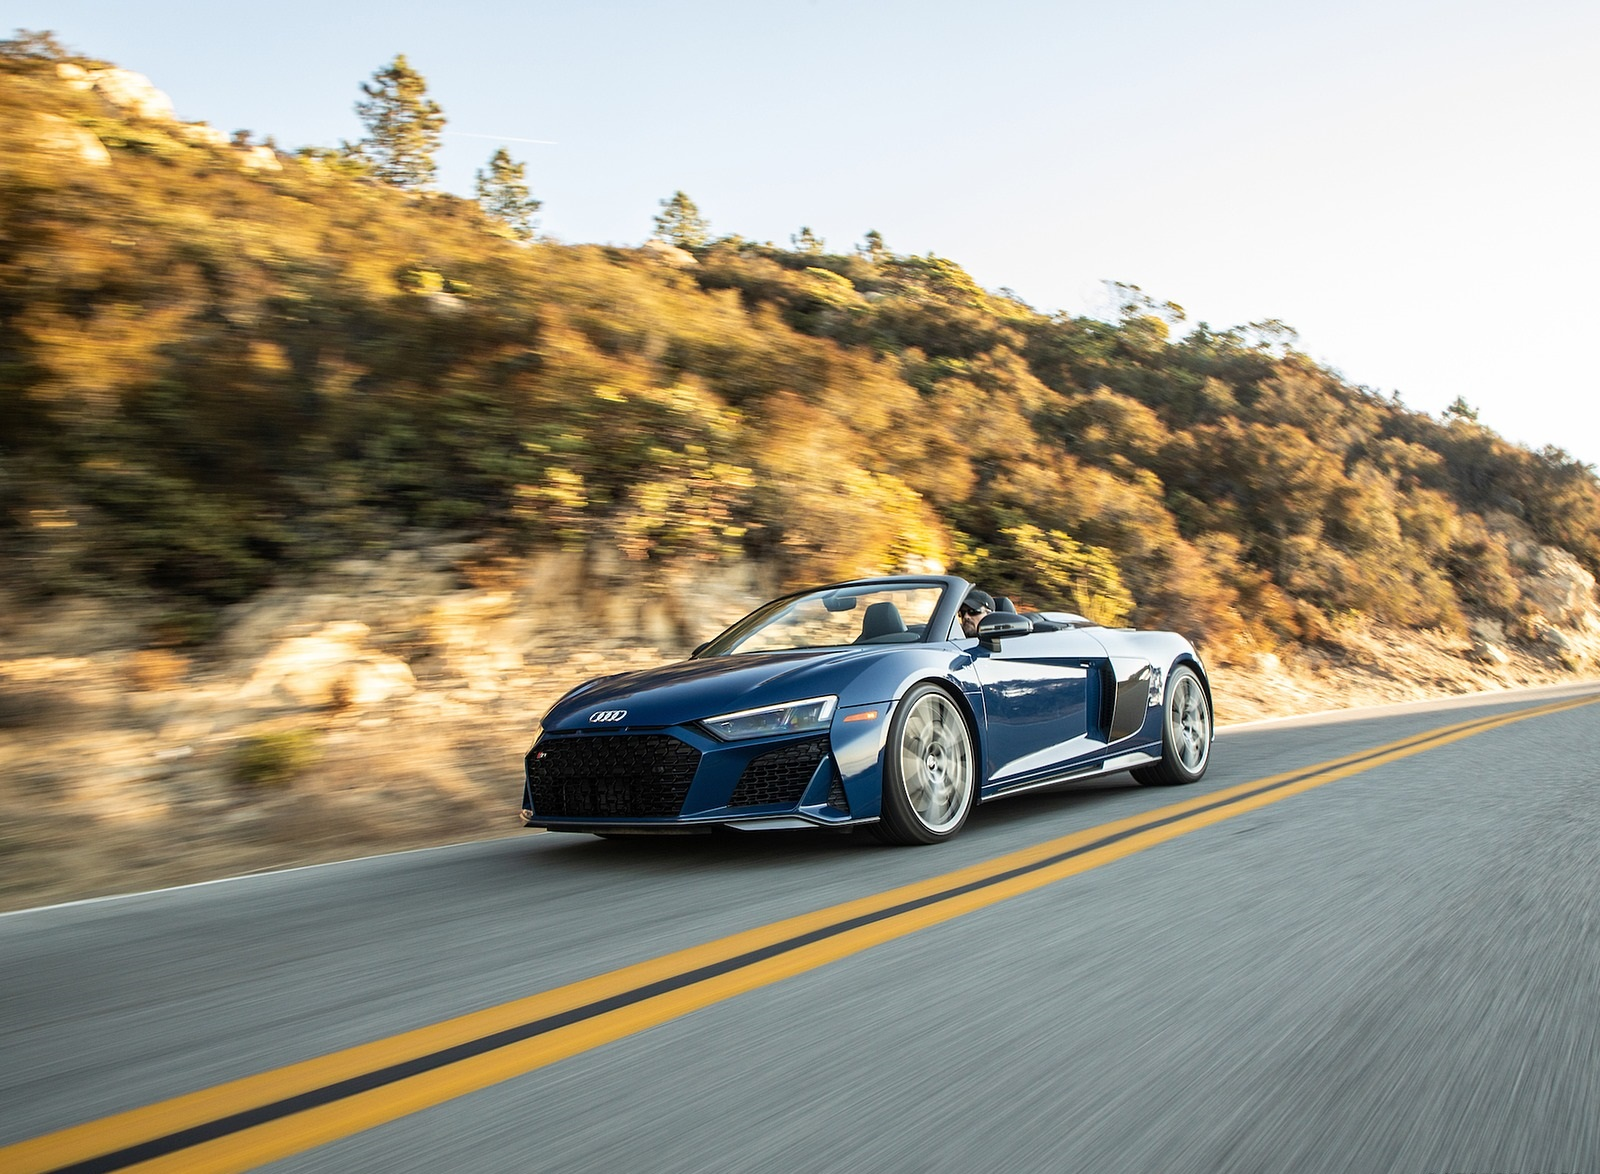 2020 Audi R8 Spyder (US-Spec) Front Three-Quarter Wallpapers (7)